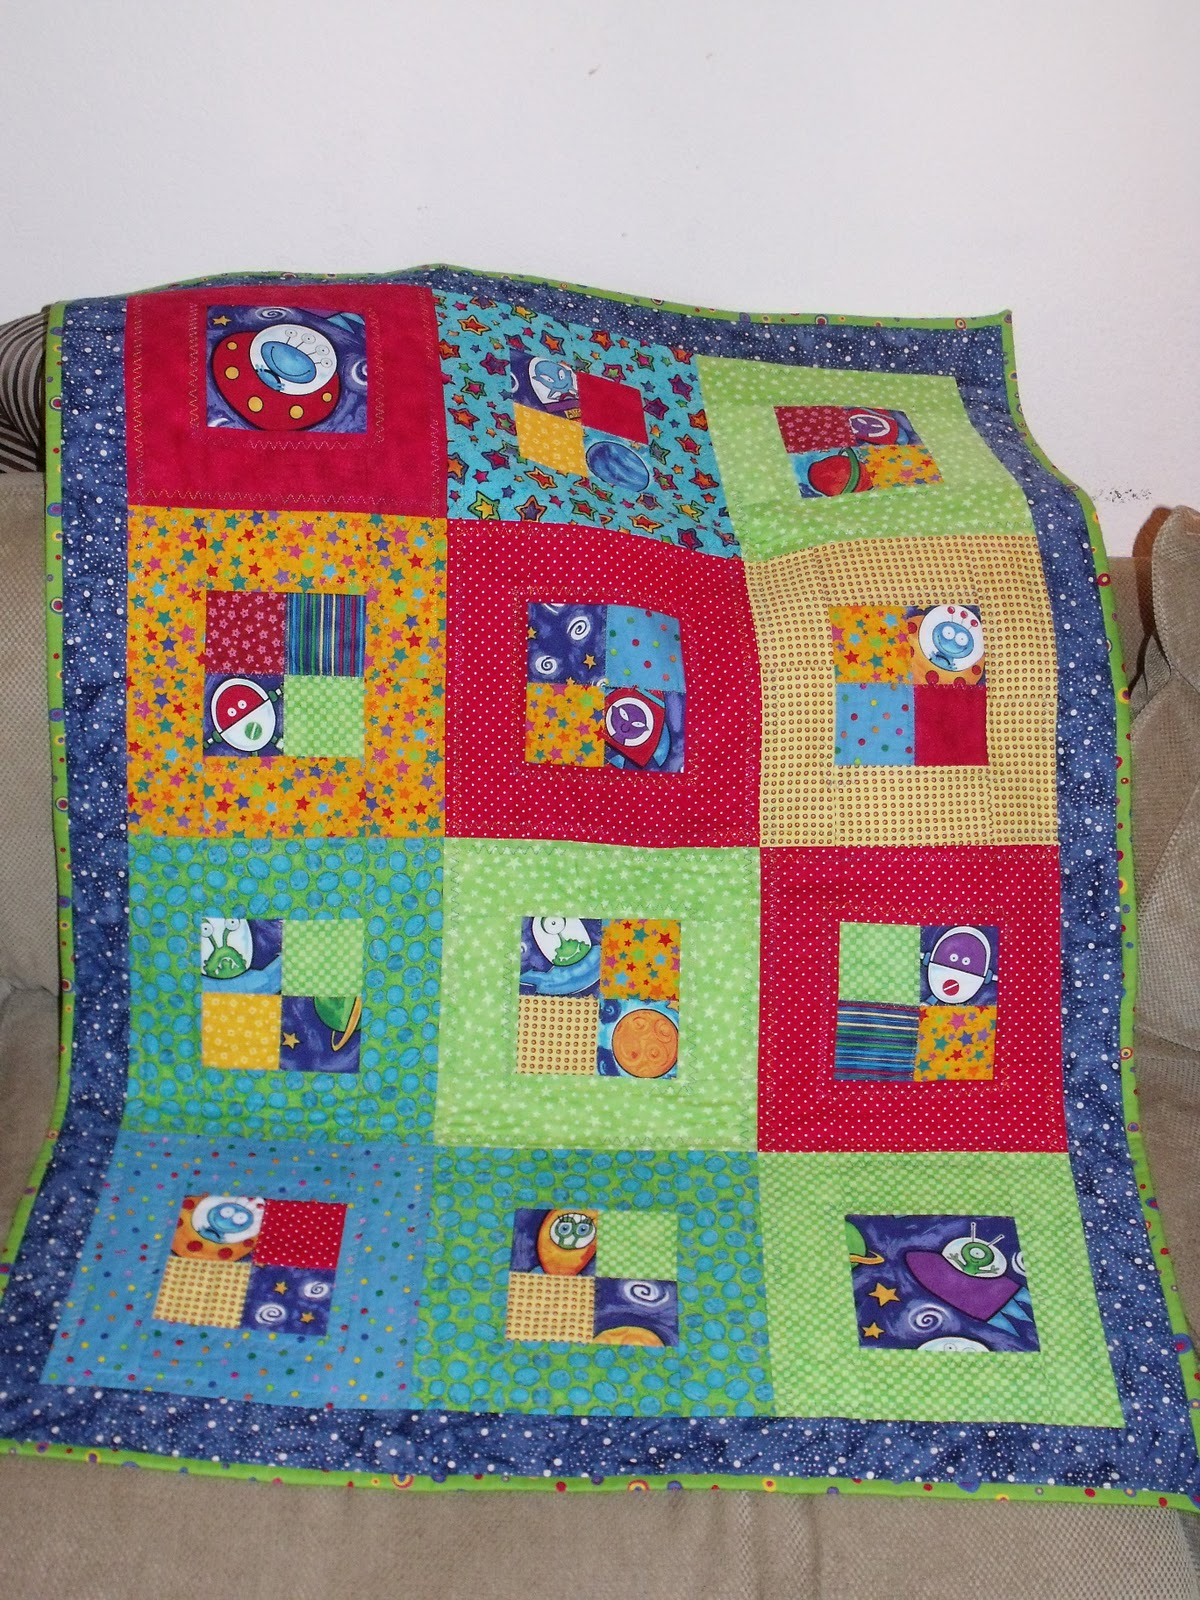 comfree quilt pattern. patchwork quilt a vector. baby quilt.